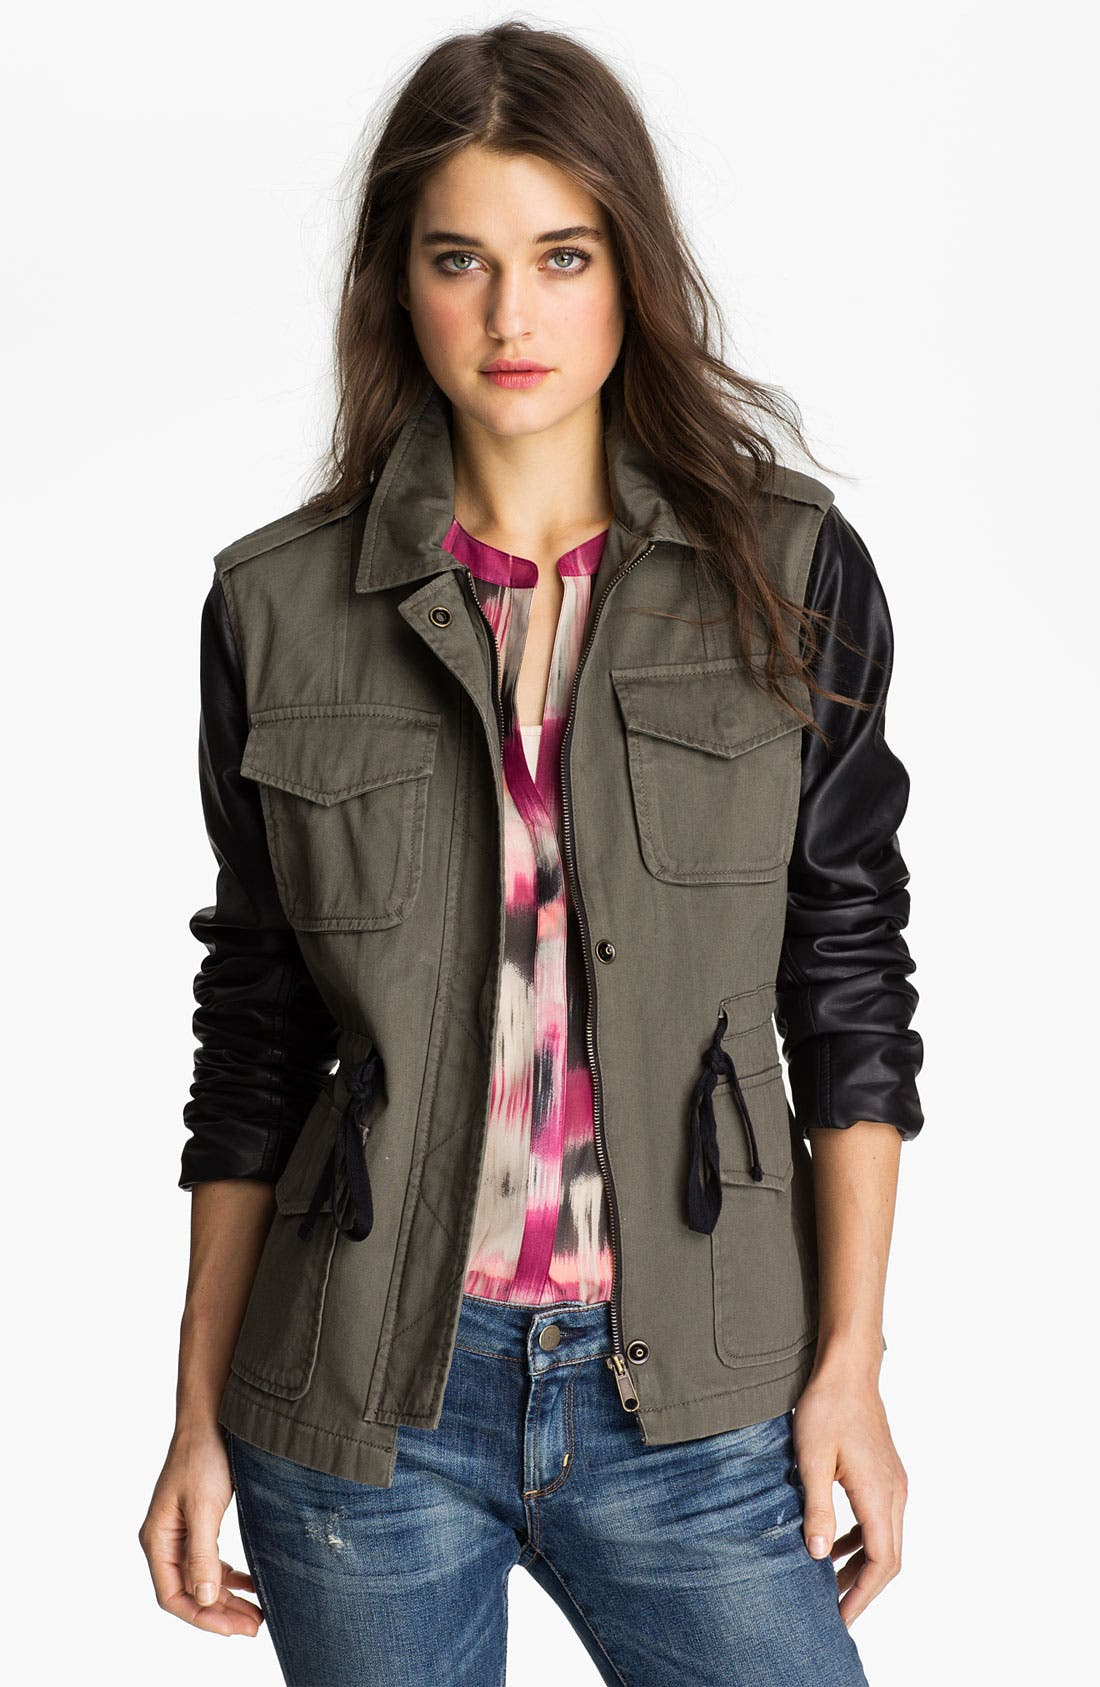 Alternate Image 1 Selected - Sanctuary Faux Leather Sleeve Army Jacket